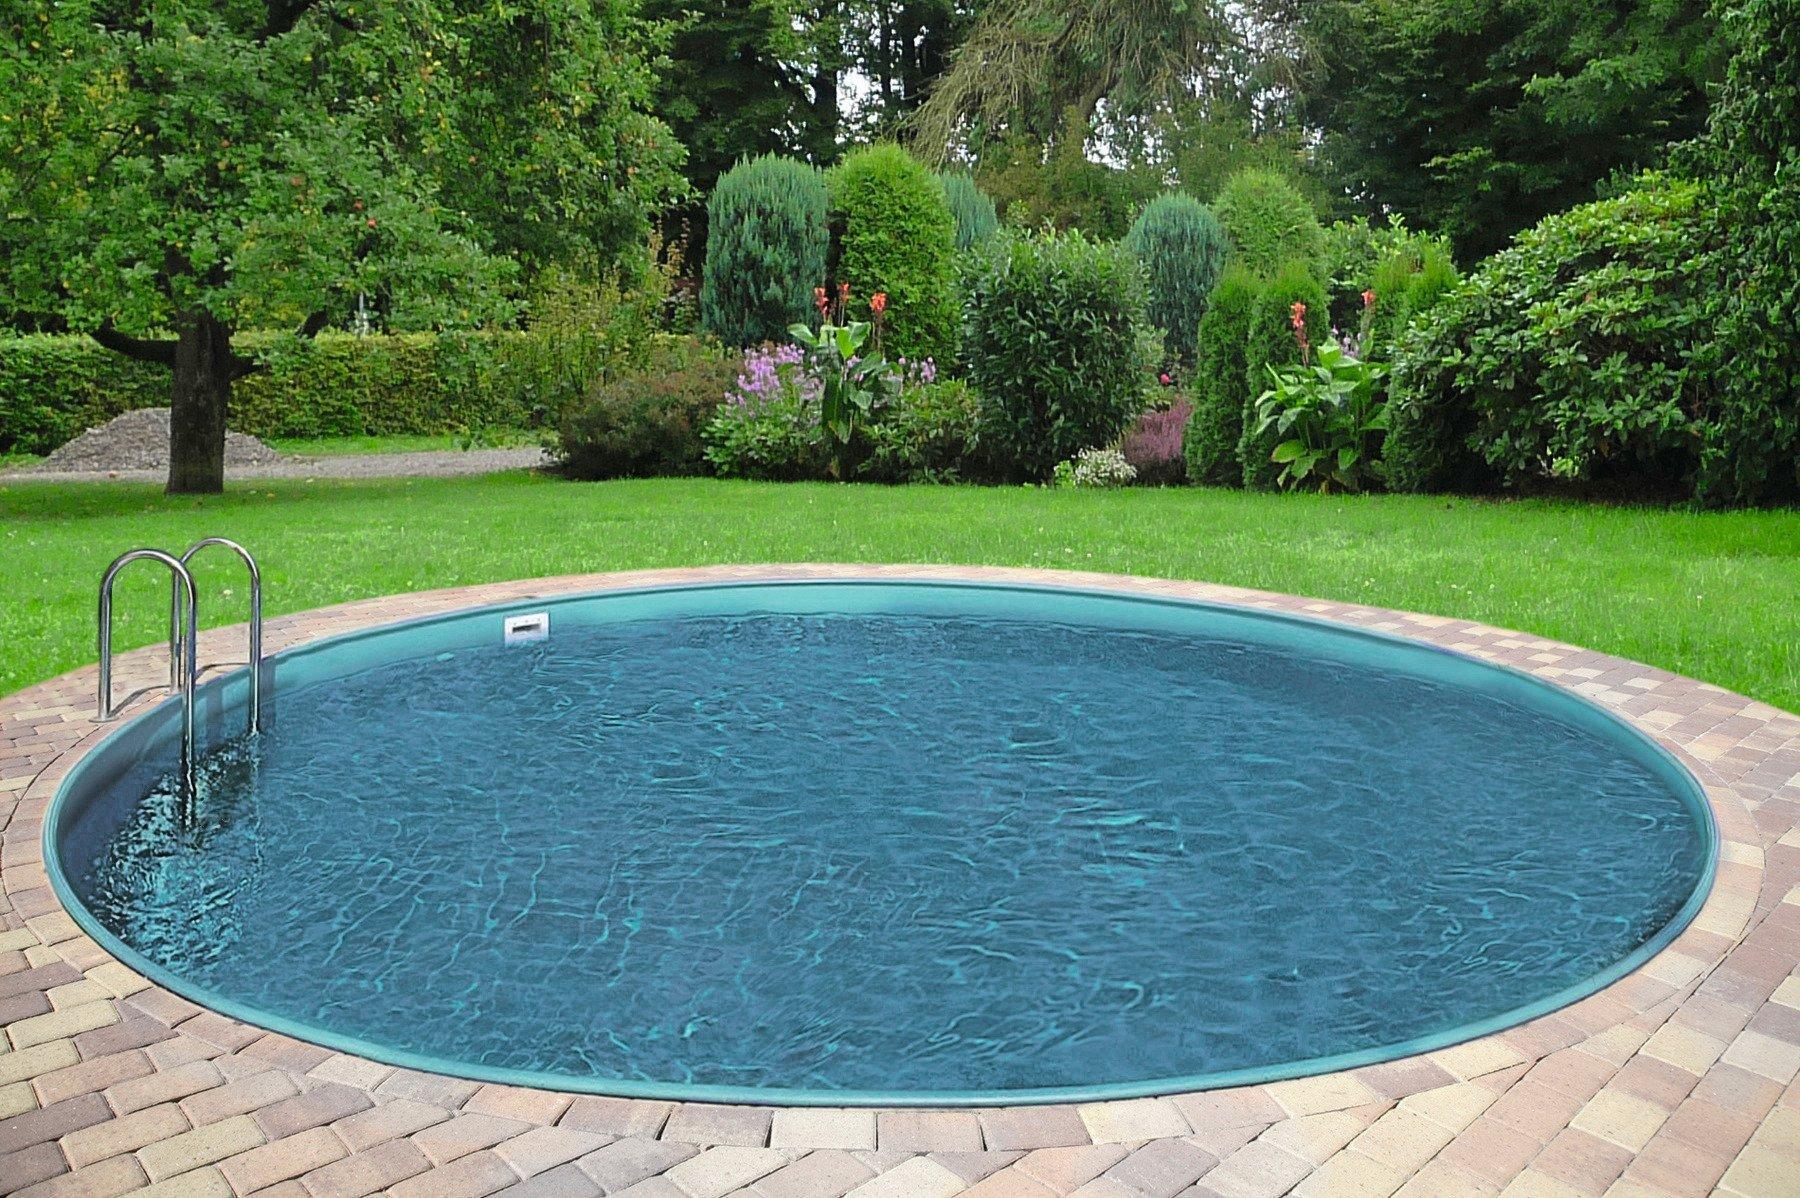 Full Size of Schwimmbecken Garten Clear Pool Rundpool Premium Ibiza Bewässerungssysteme Test Bewässerung Automatisch Rattan Sofa Kräutergarten Küche Trennwand Holzhaus Garten Schwimmbecken Garten